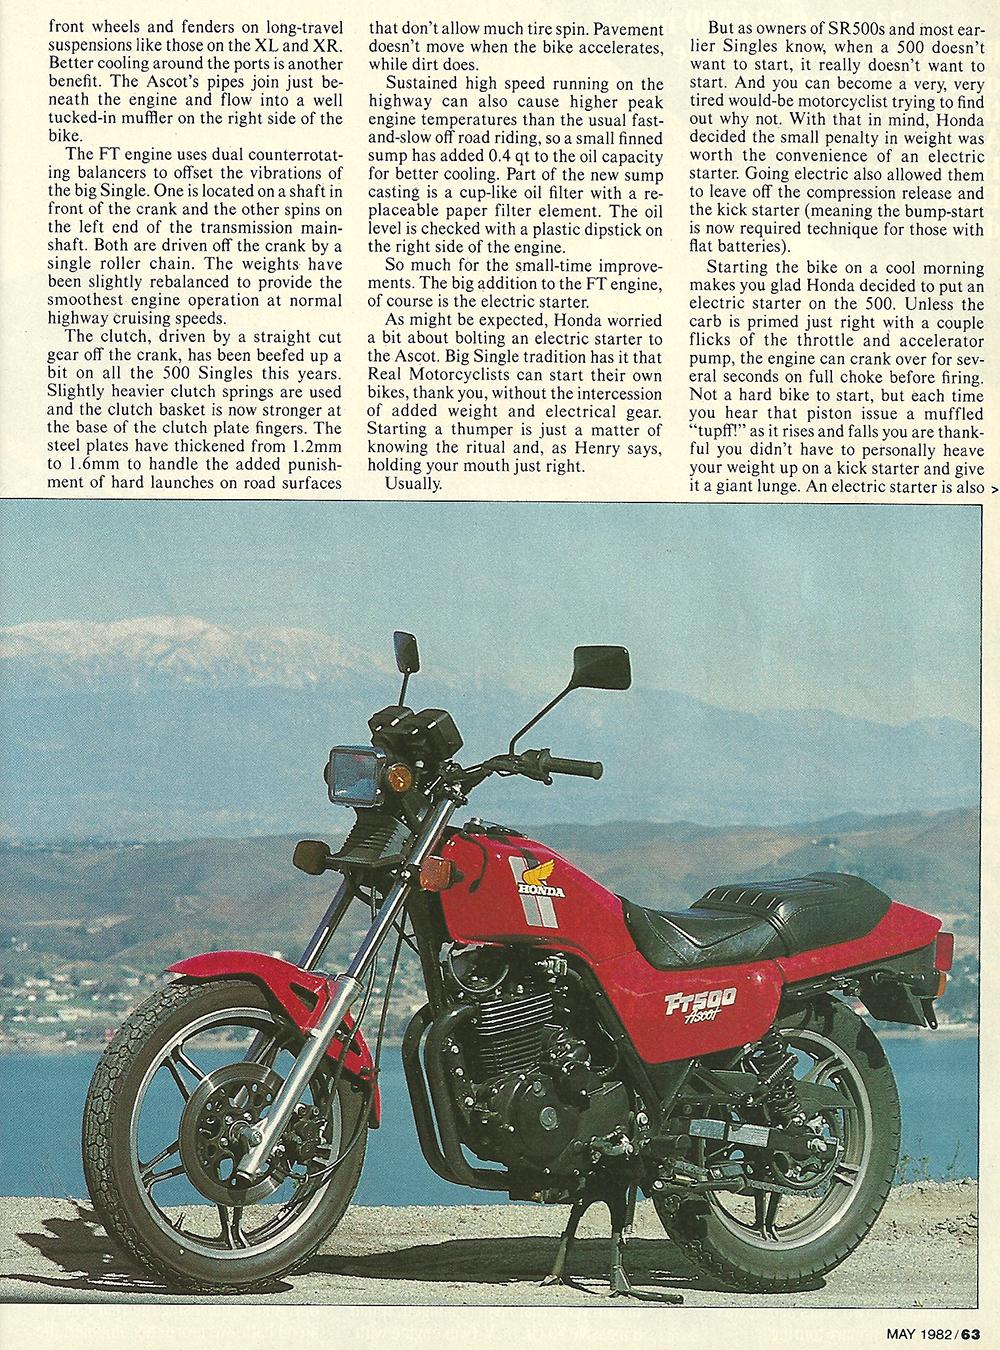 1982 Honda FT500 Ascot road test 04.jpg